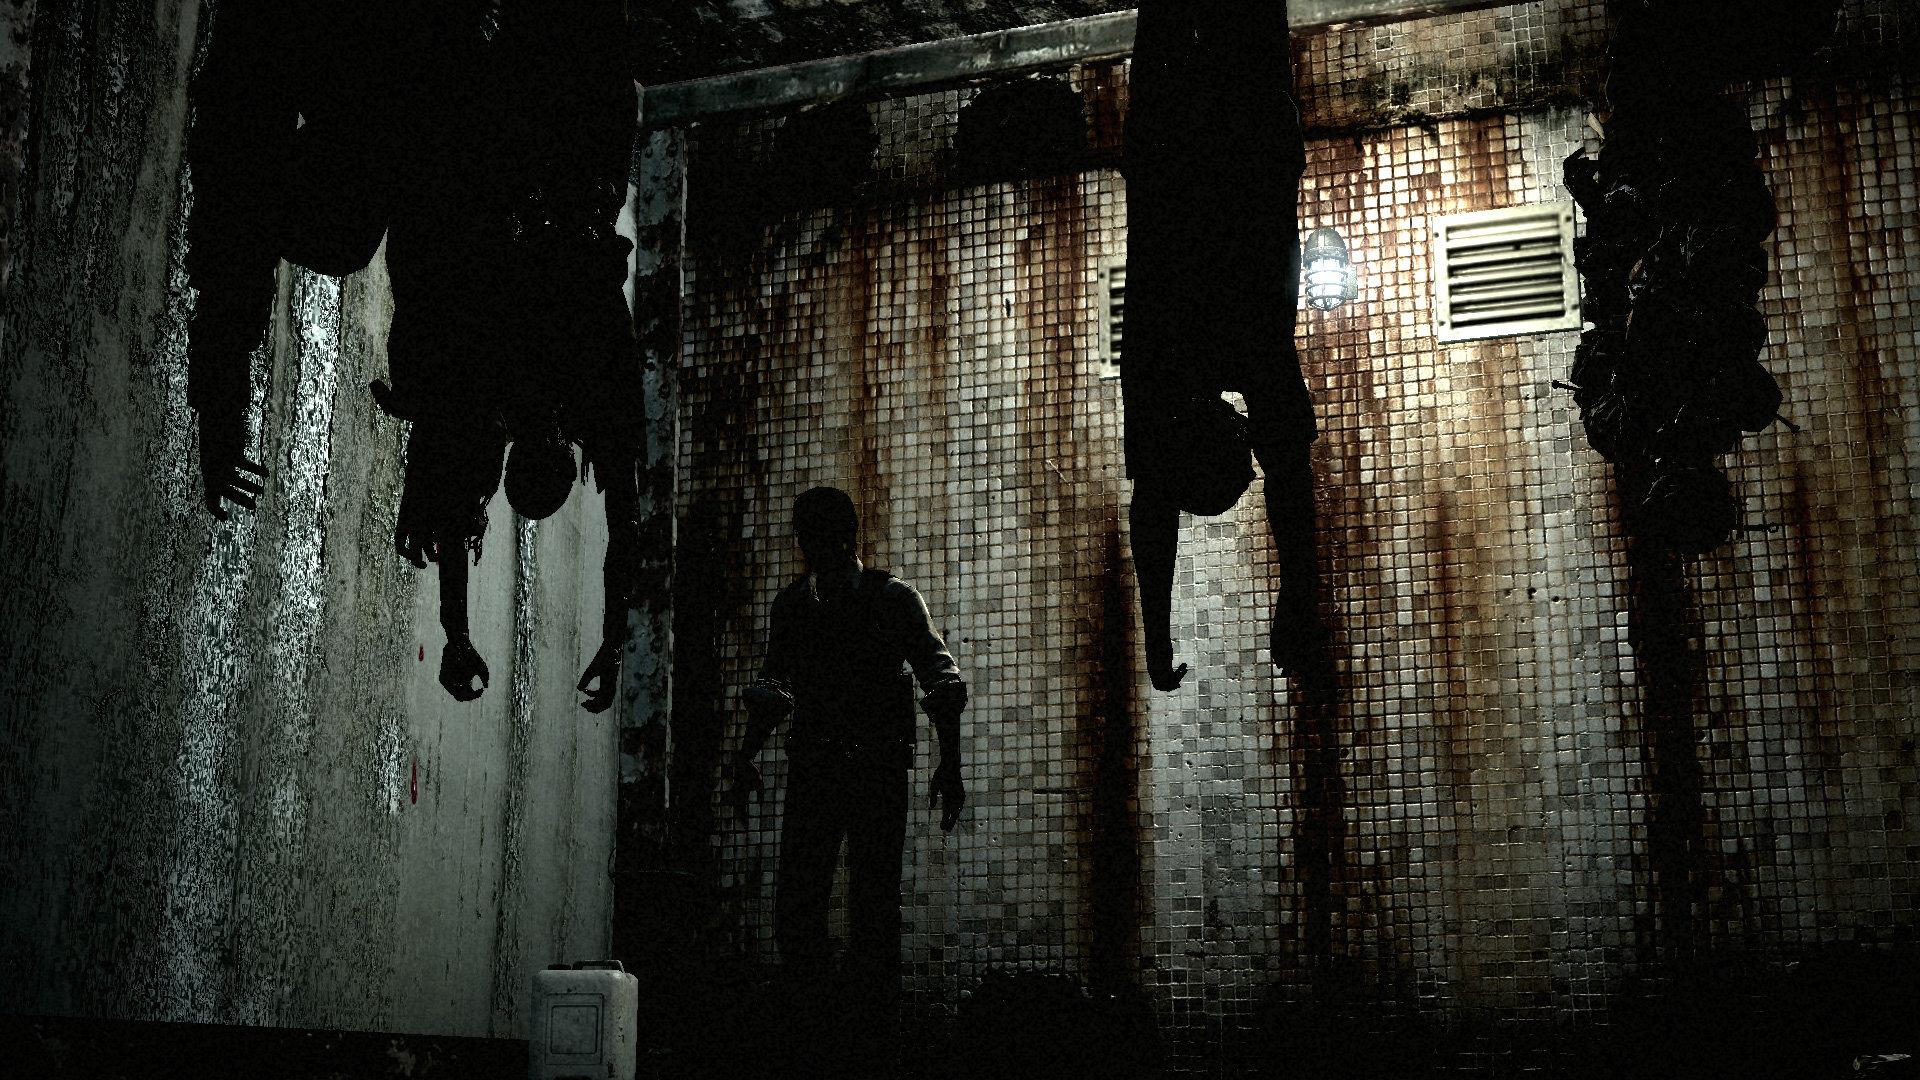 [Jeu Vidéo] The Evil Within'  The-evil-within-screen-09-us-18jun14?$MediaCarousel_Original$